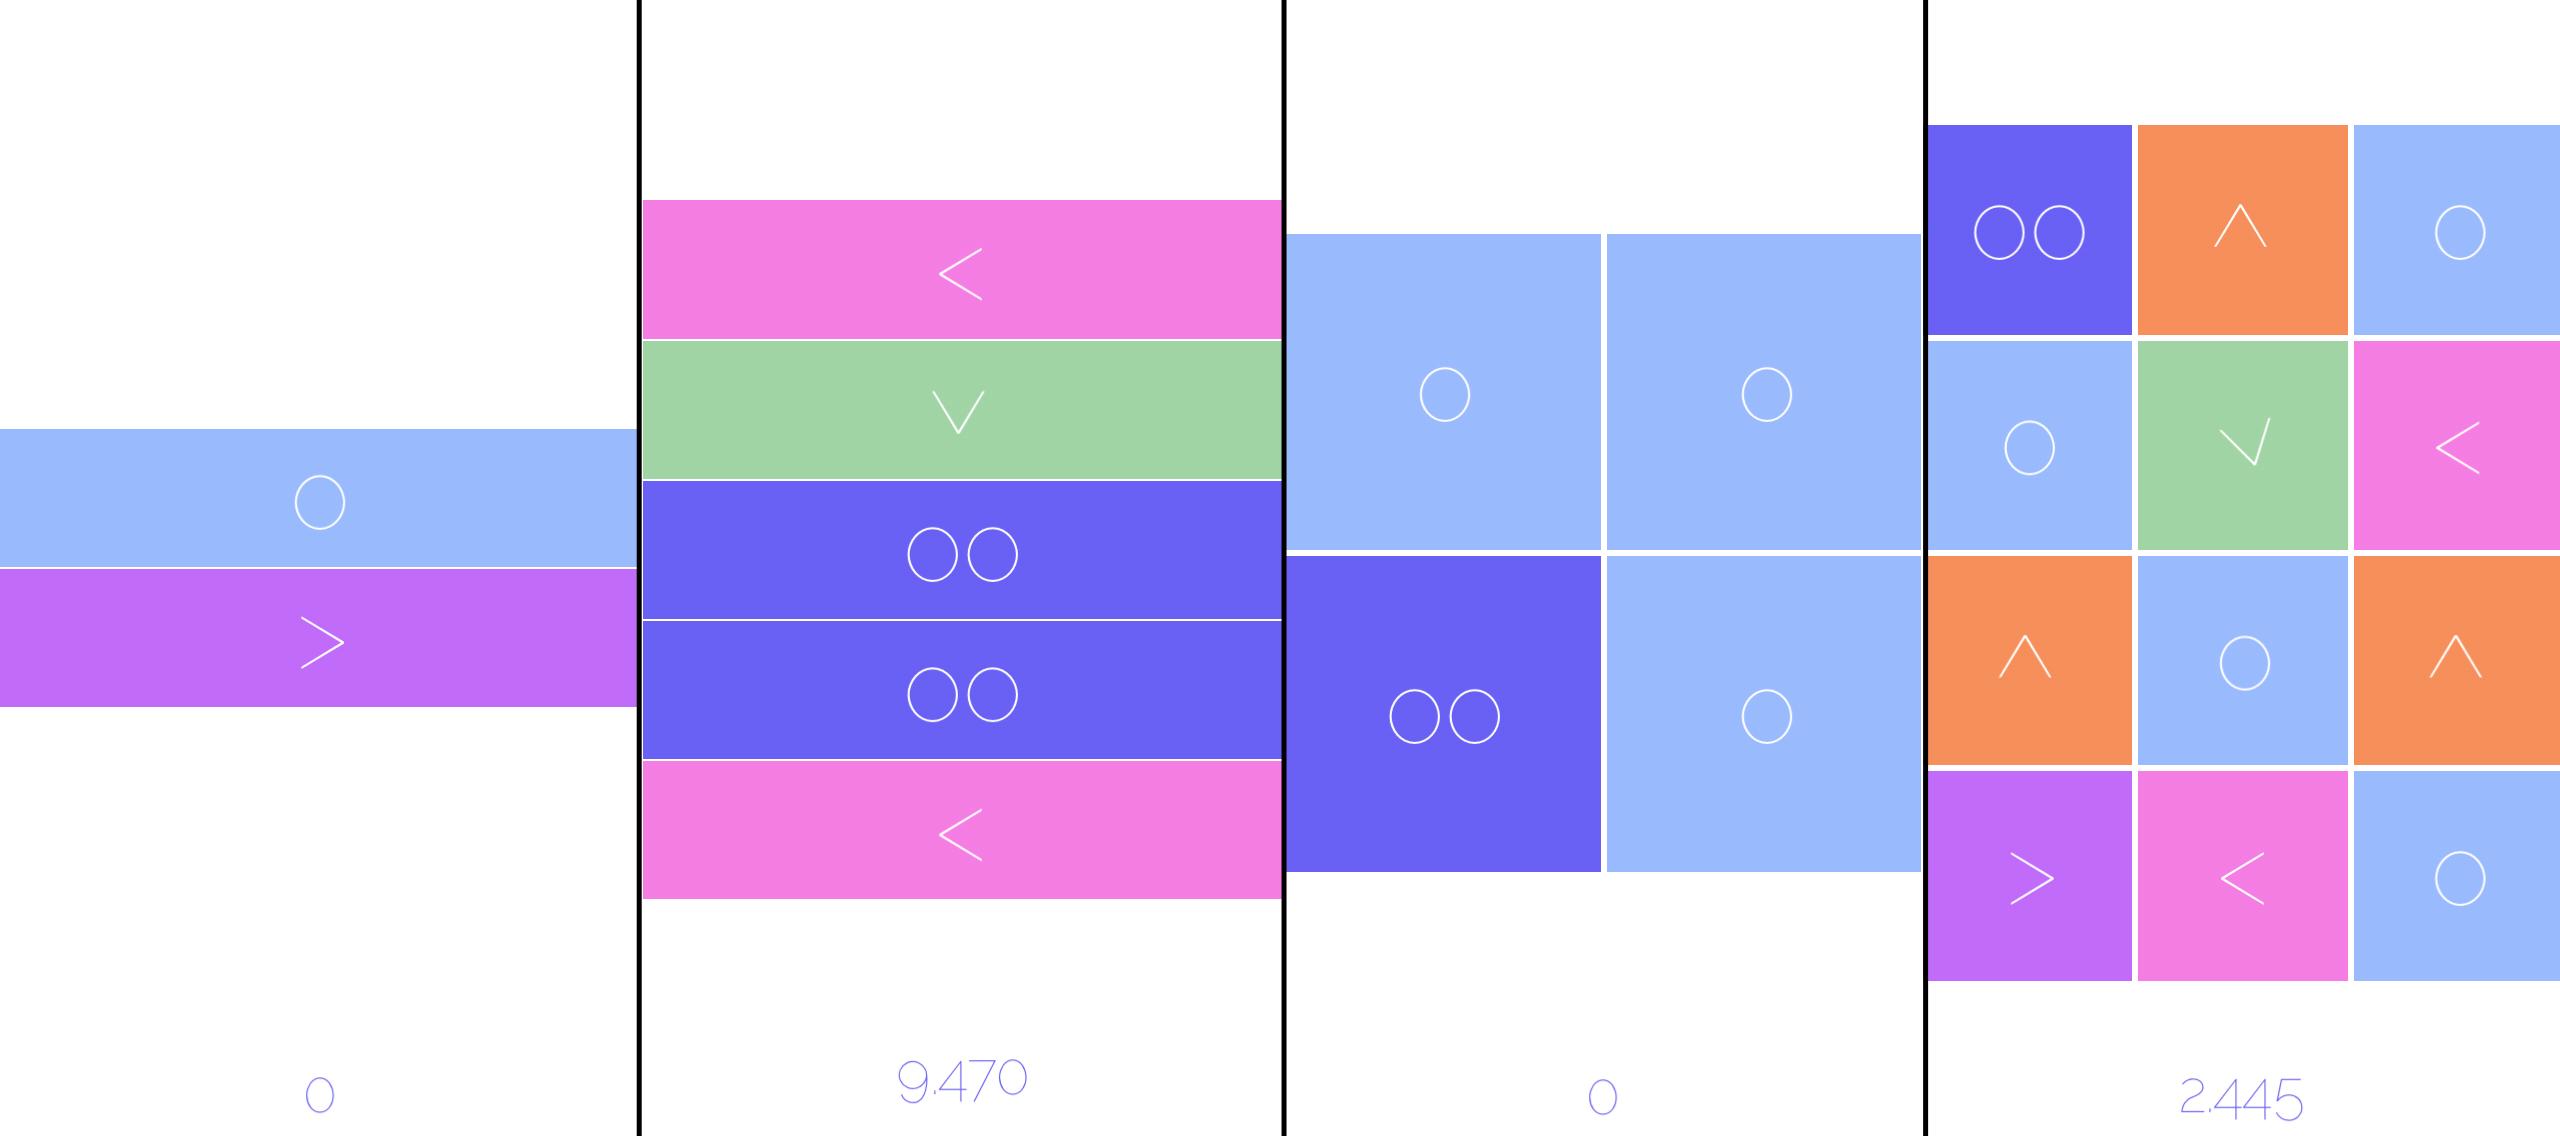 Teggle modo standar y square